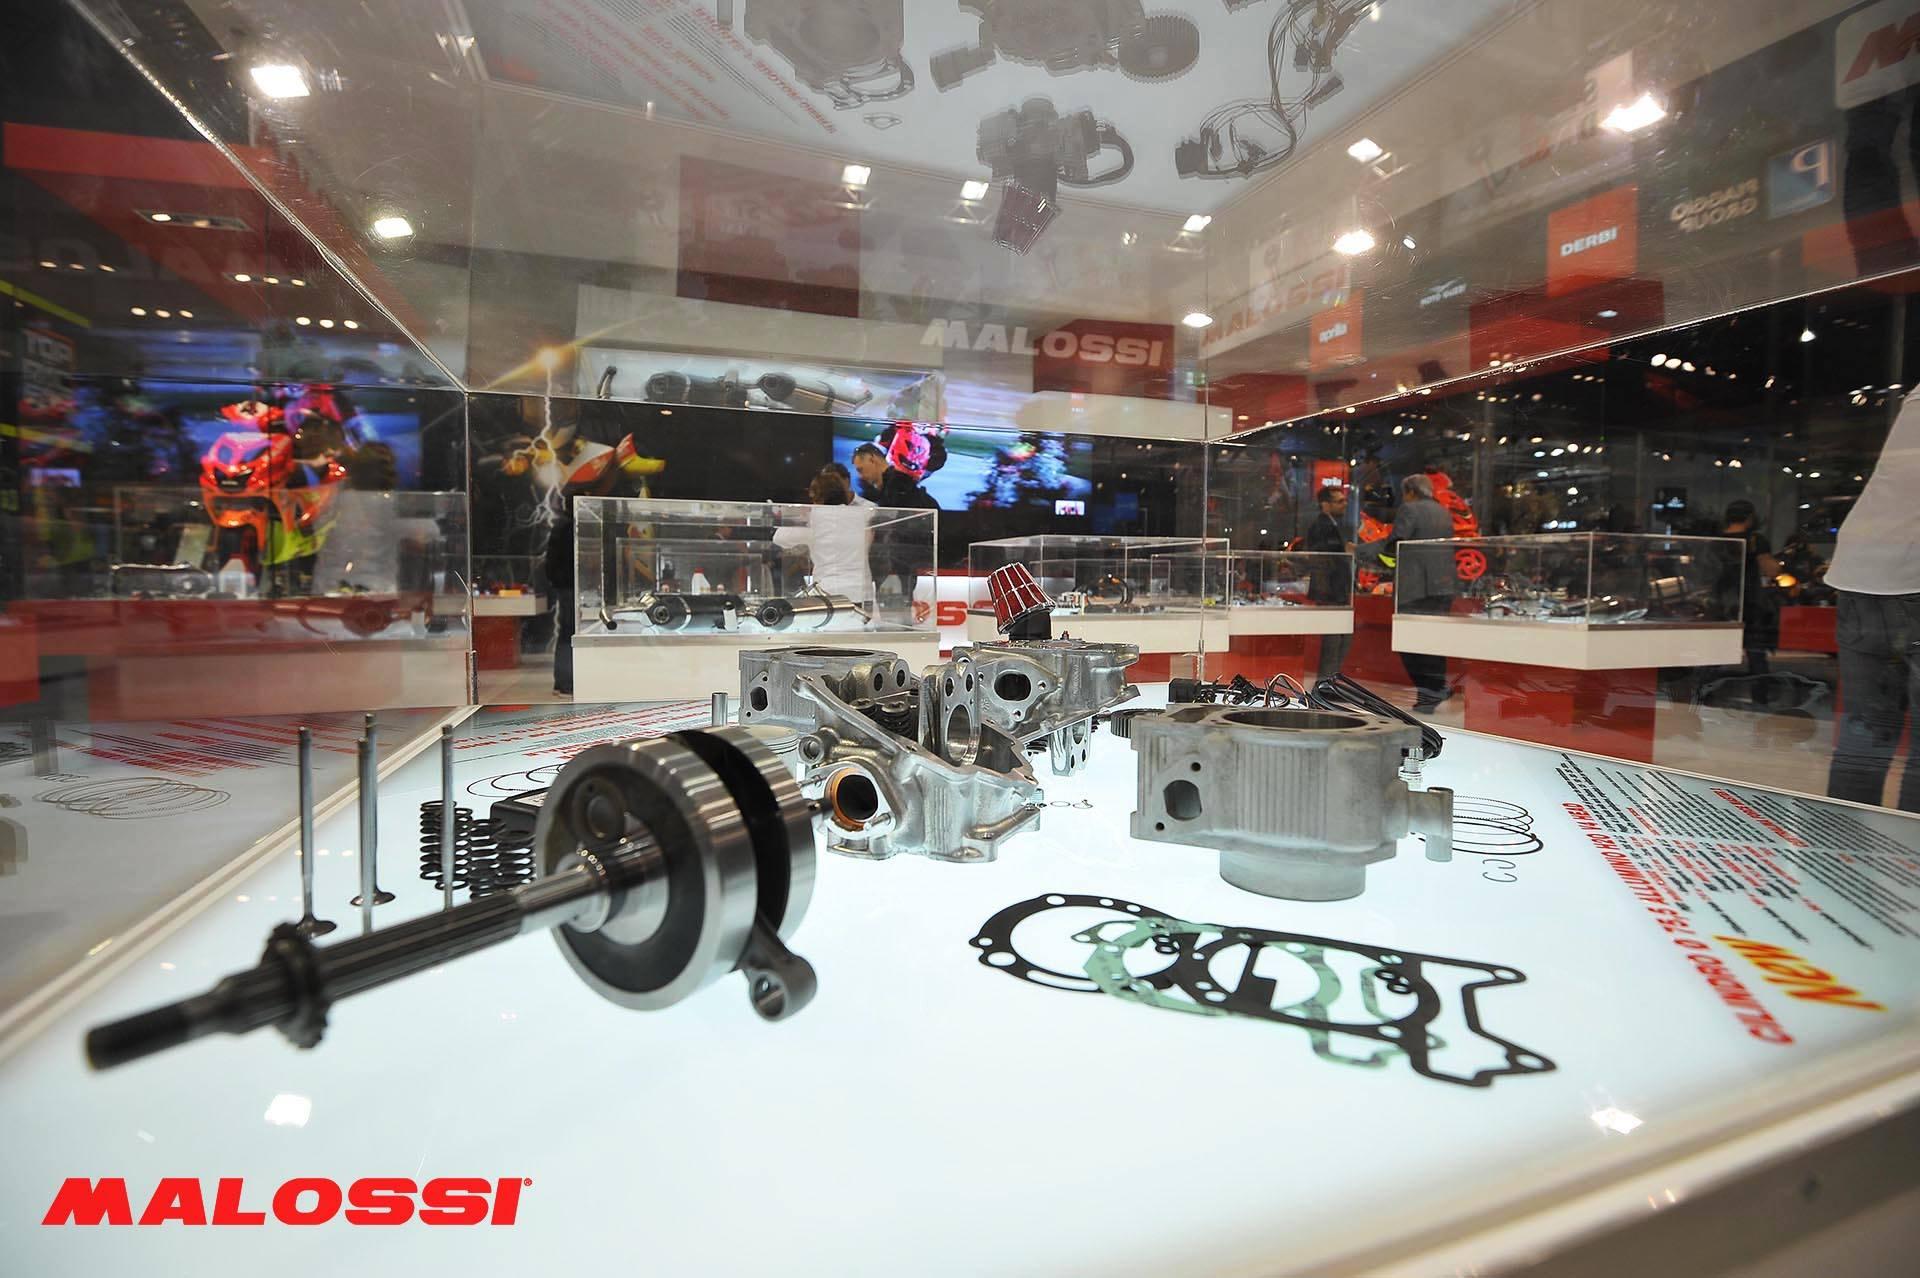 pieces-moteur-malossi-mobylette-peugeot-103-mbk-51-piaggio-ciao